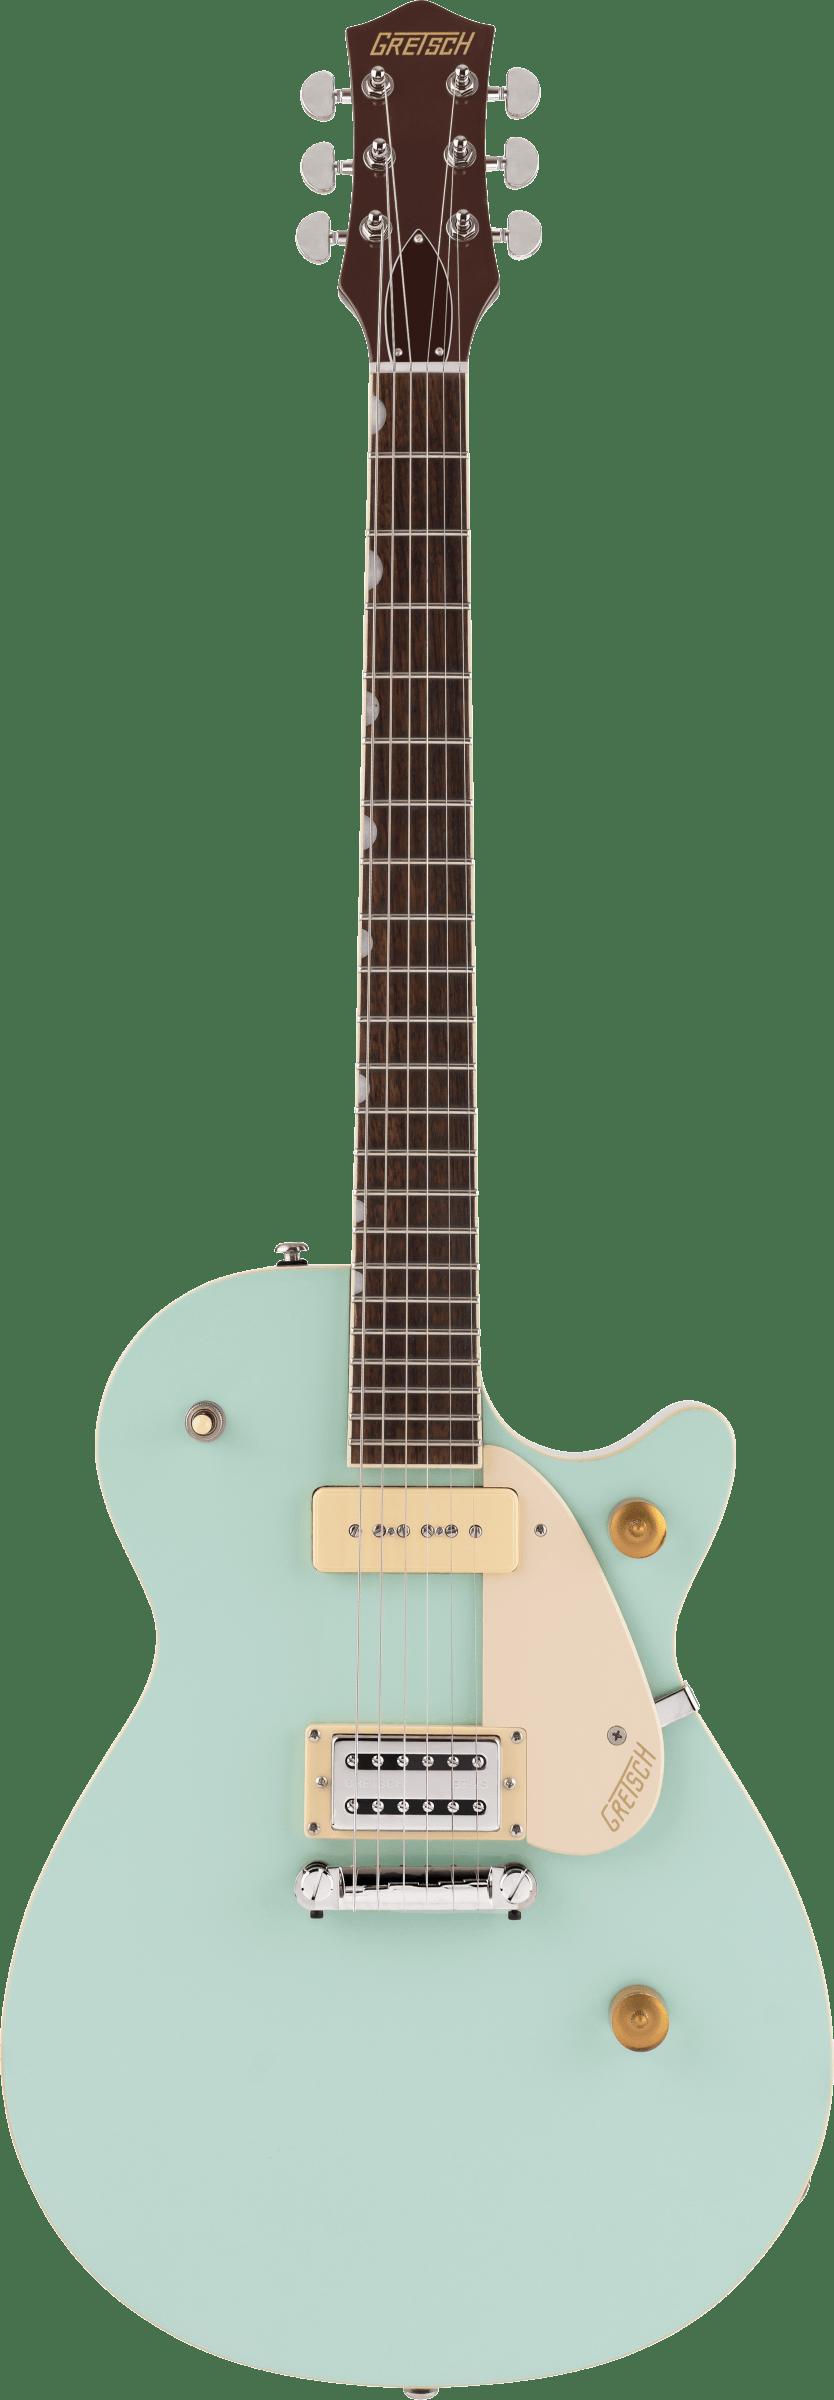 GRETSCH G2215 P90